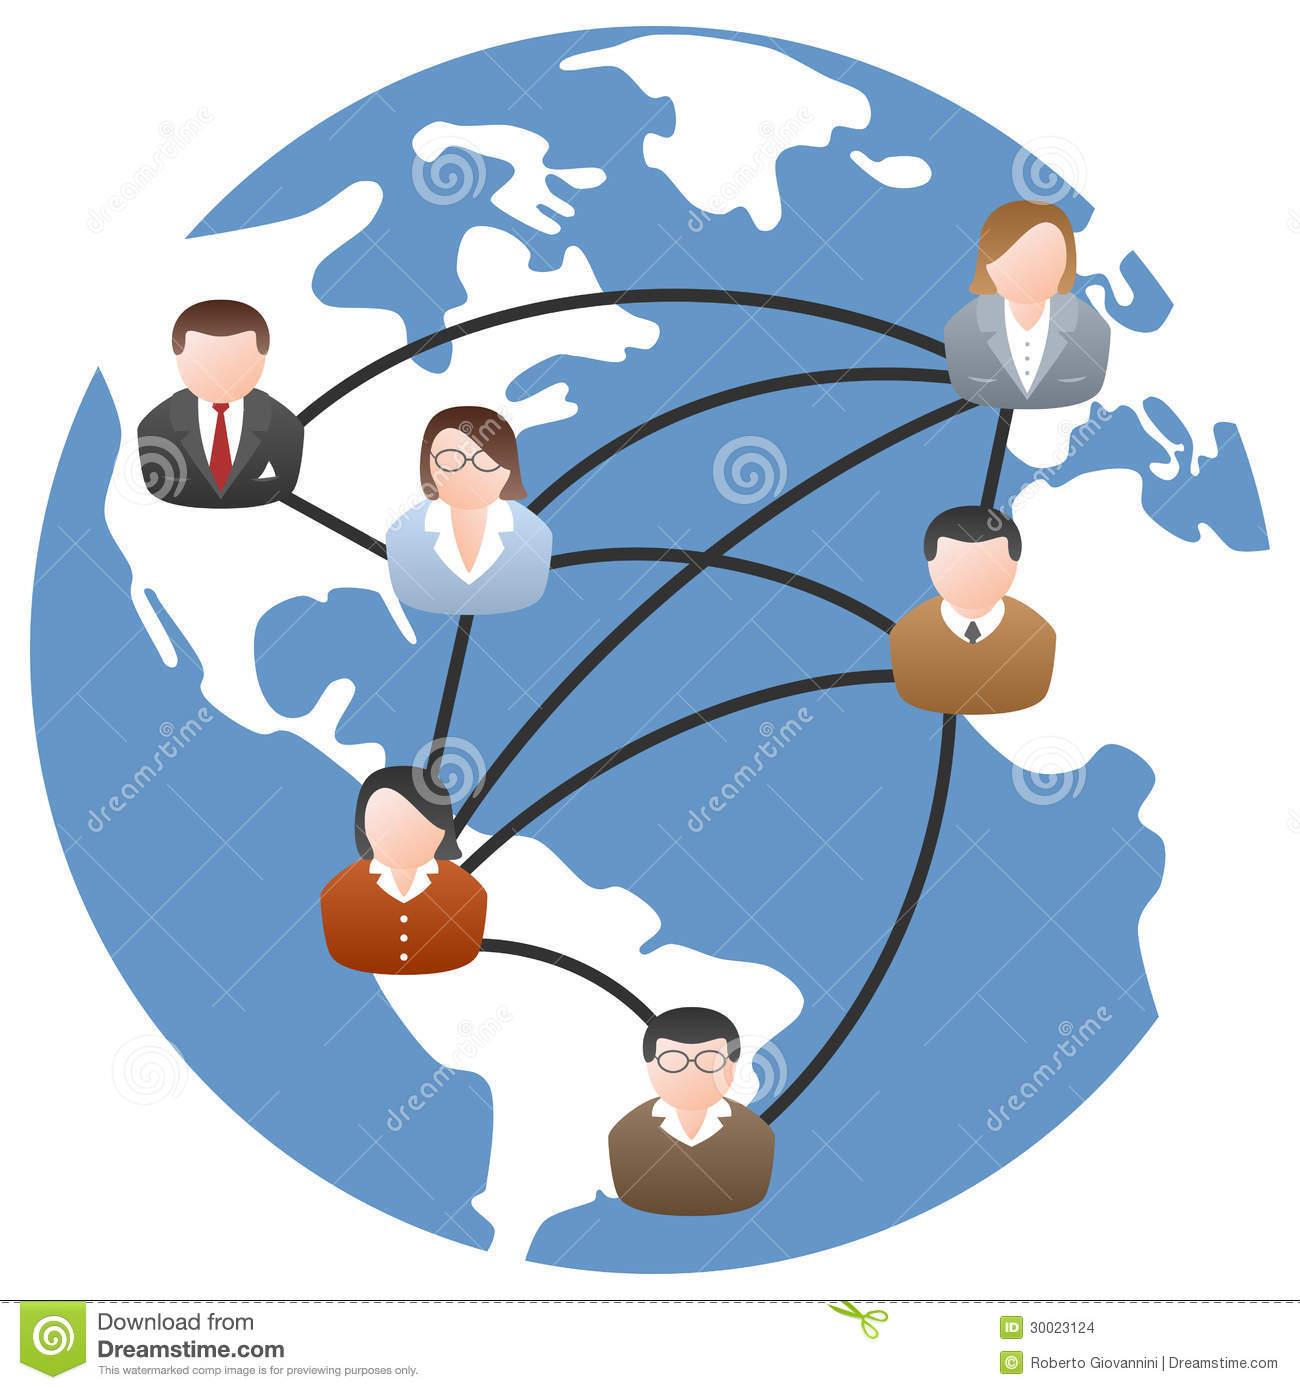 World Communication Network Stock Images.